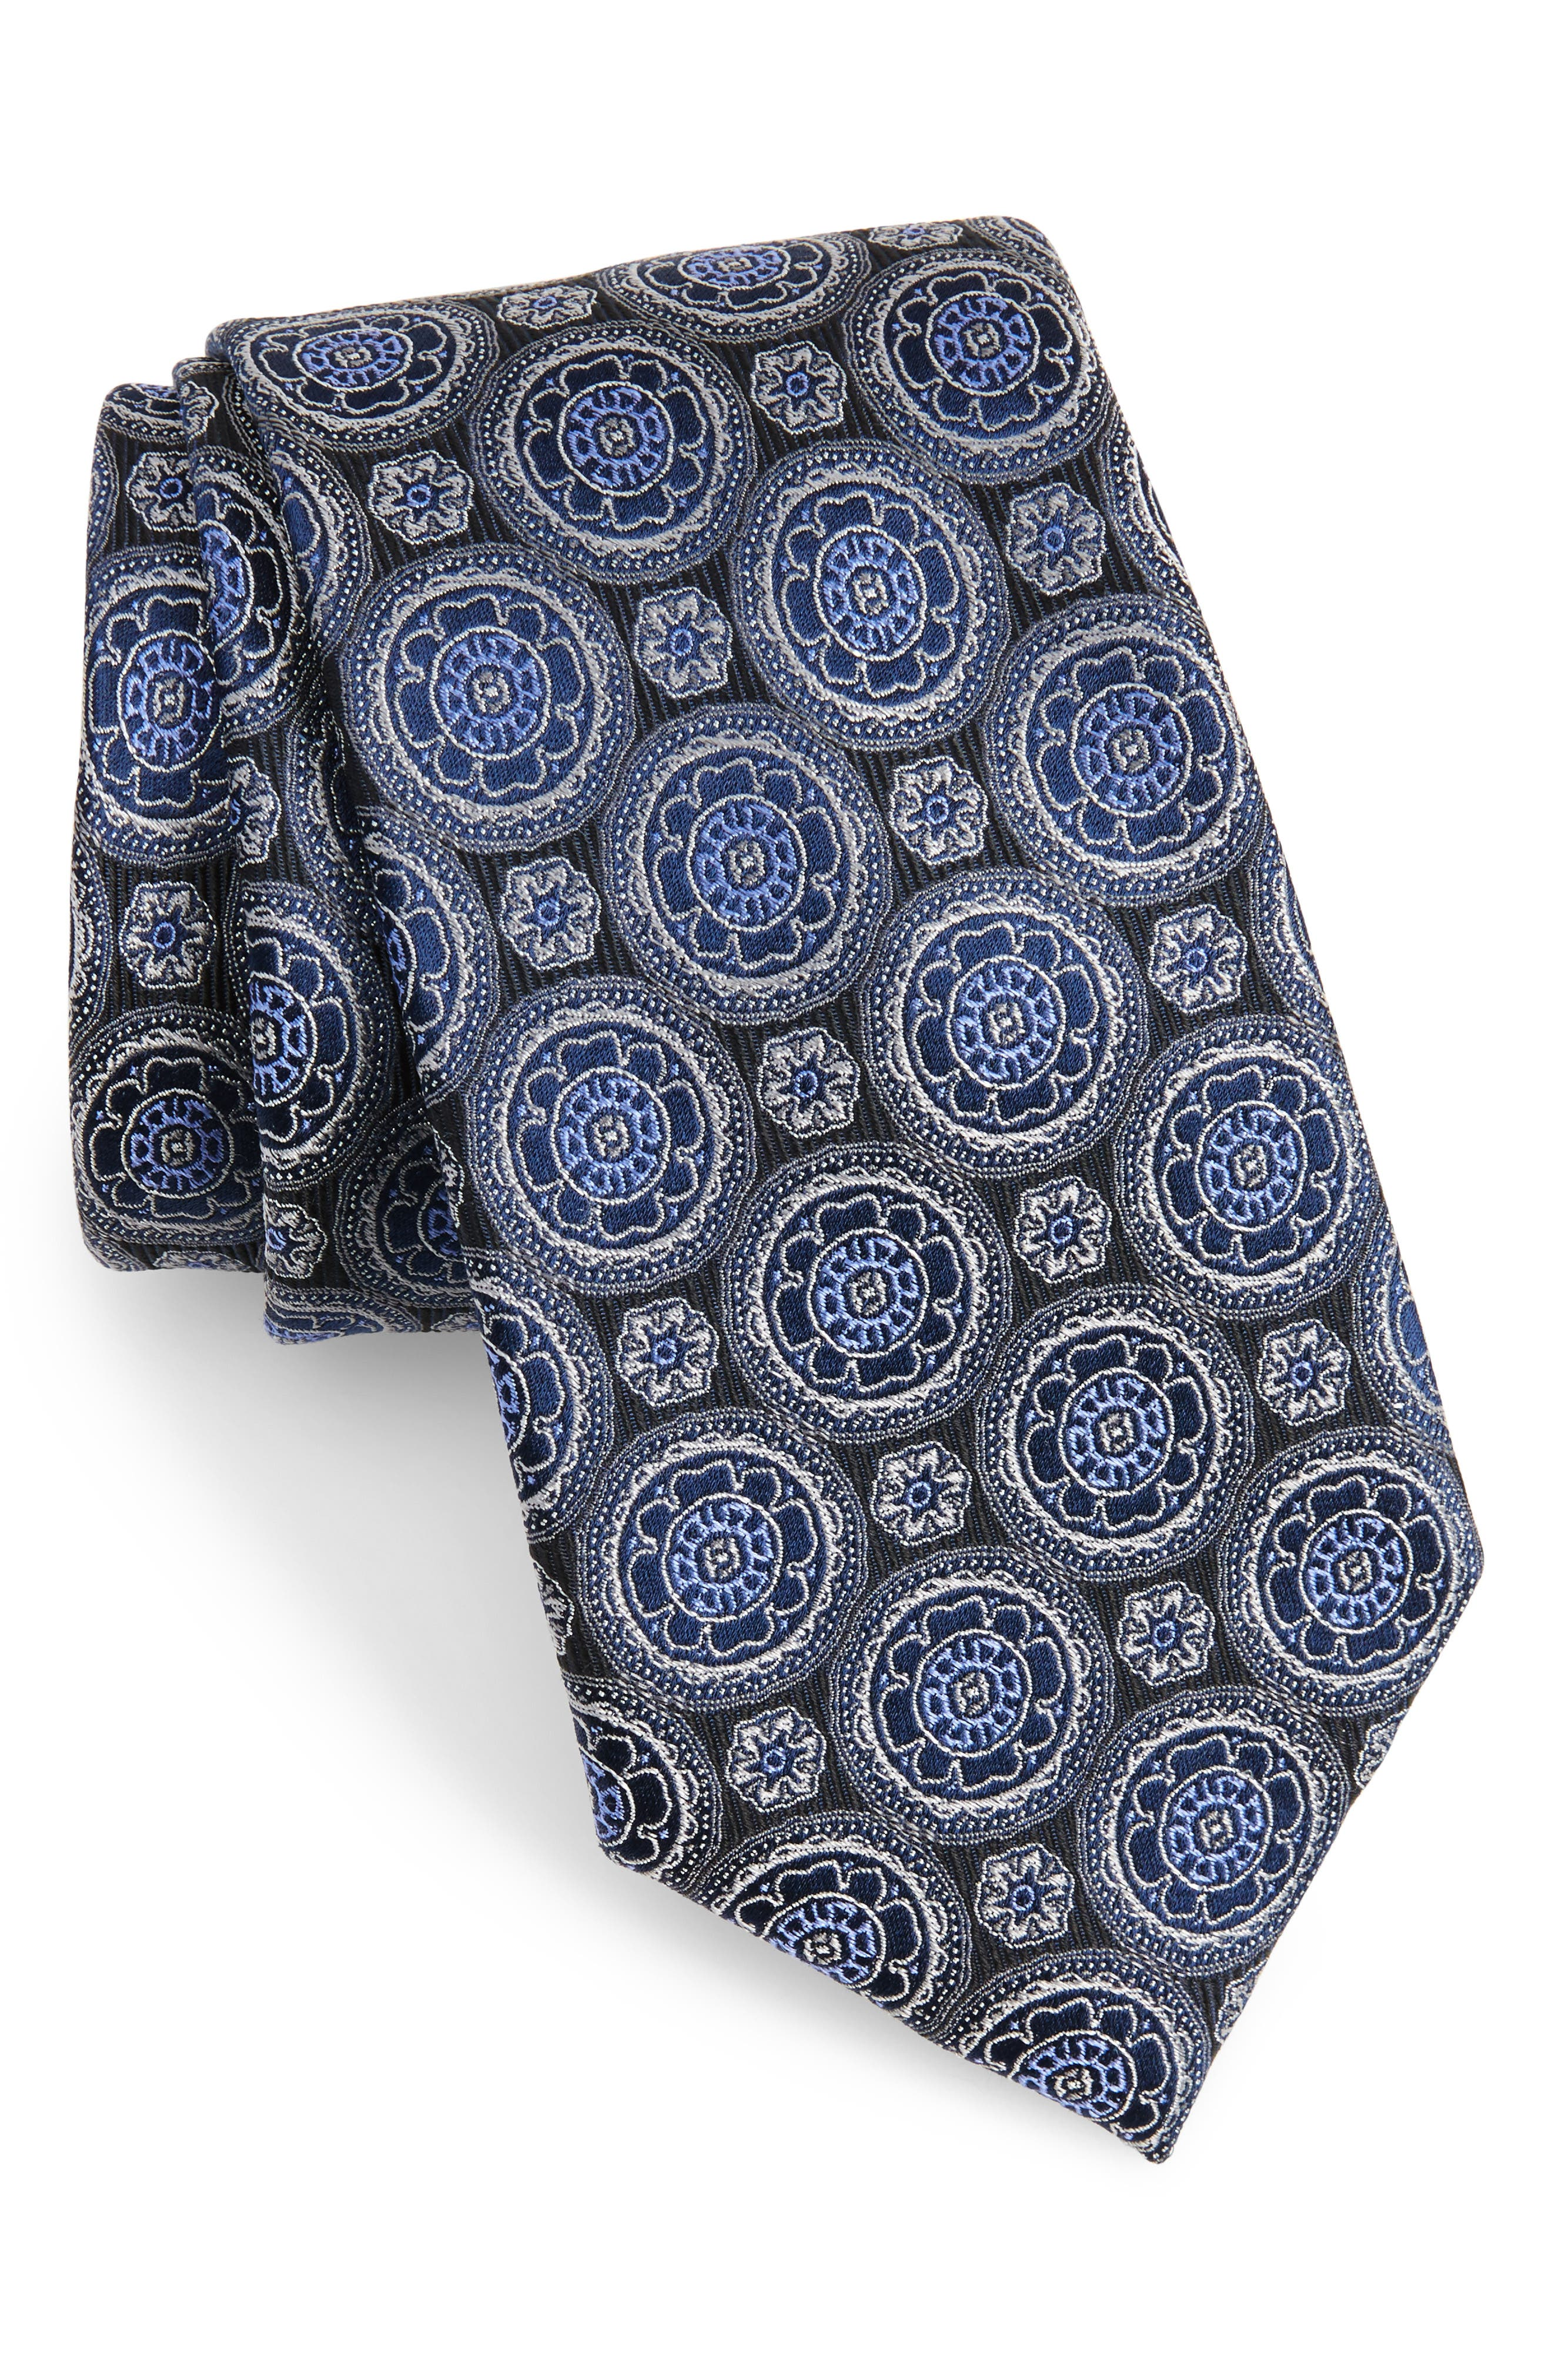 Kensington Medallion Silk Tie,                         Main,                         color, 001